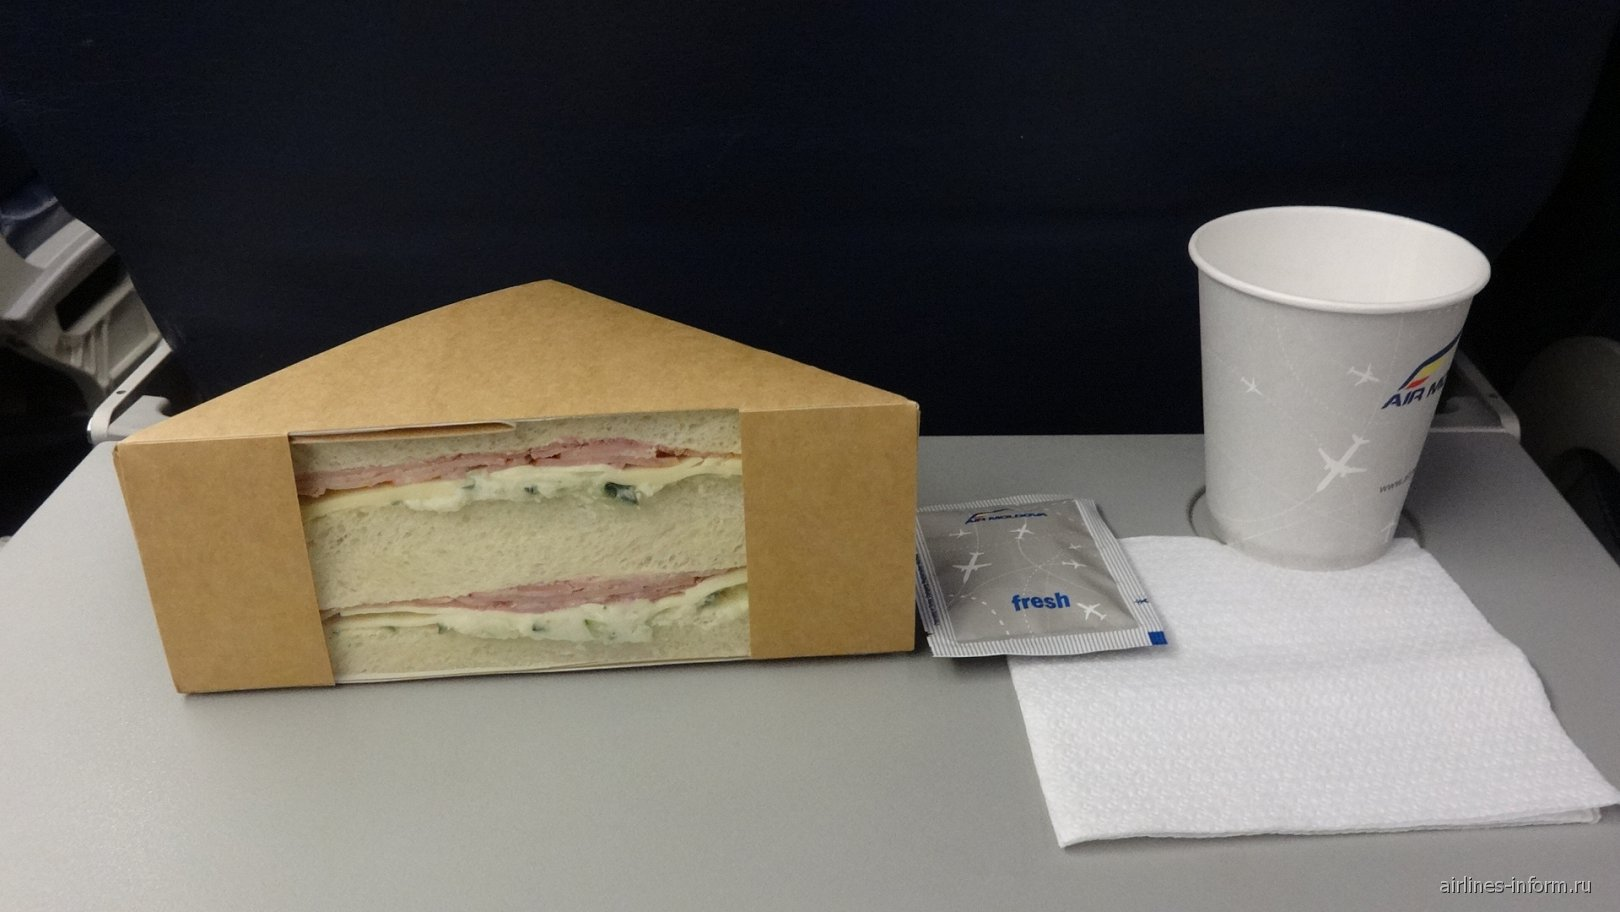 Бортпитание на рейсе Кишинев-Венеция авиакомпании Air Moldova